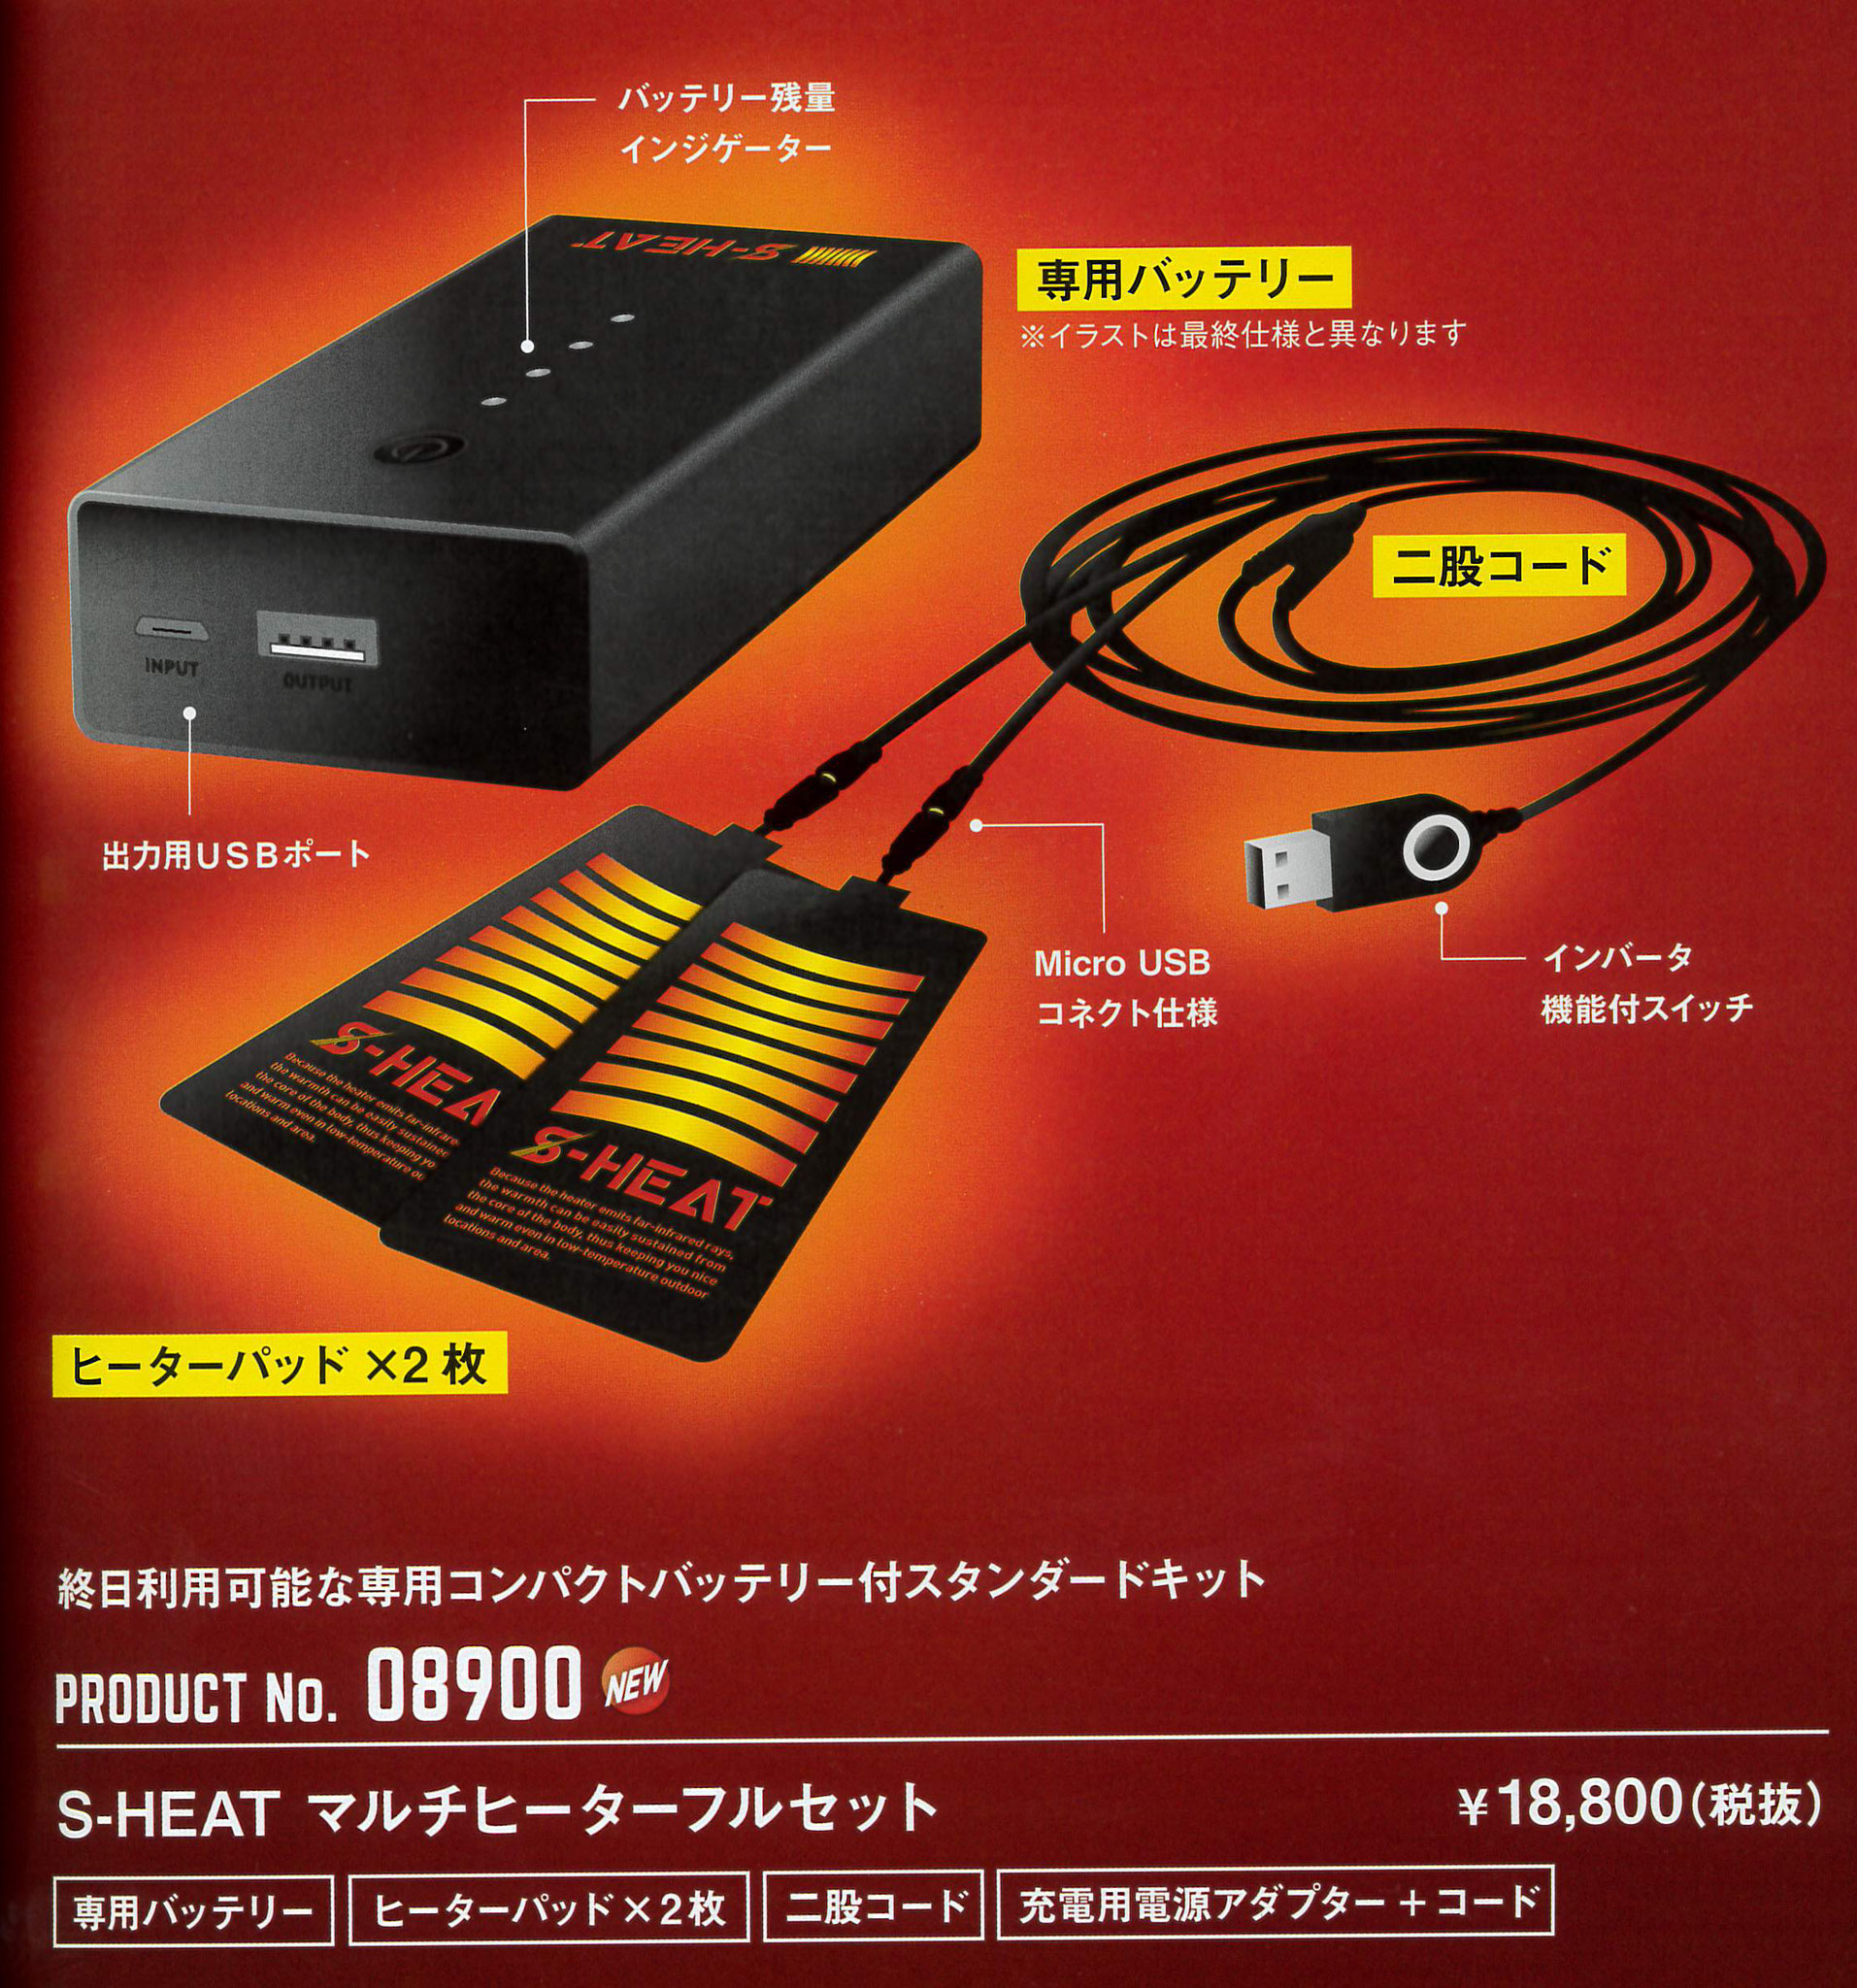 S-HEAT~エス・ヒート~暖房機器 08900シリーズ。最先端の暖房機器です。